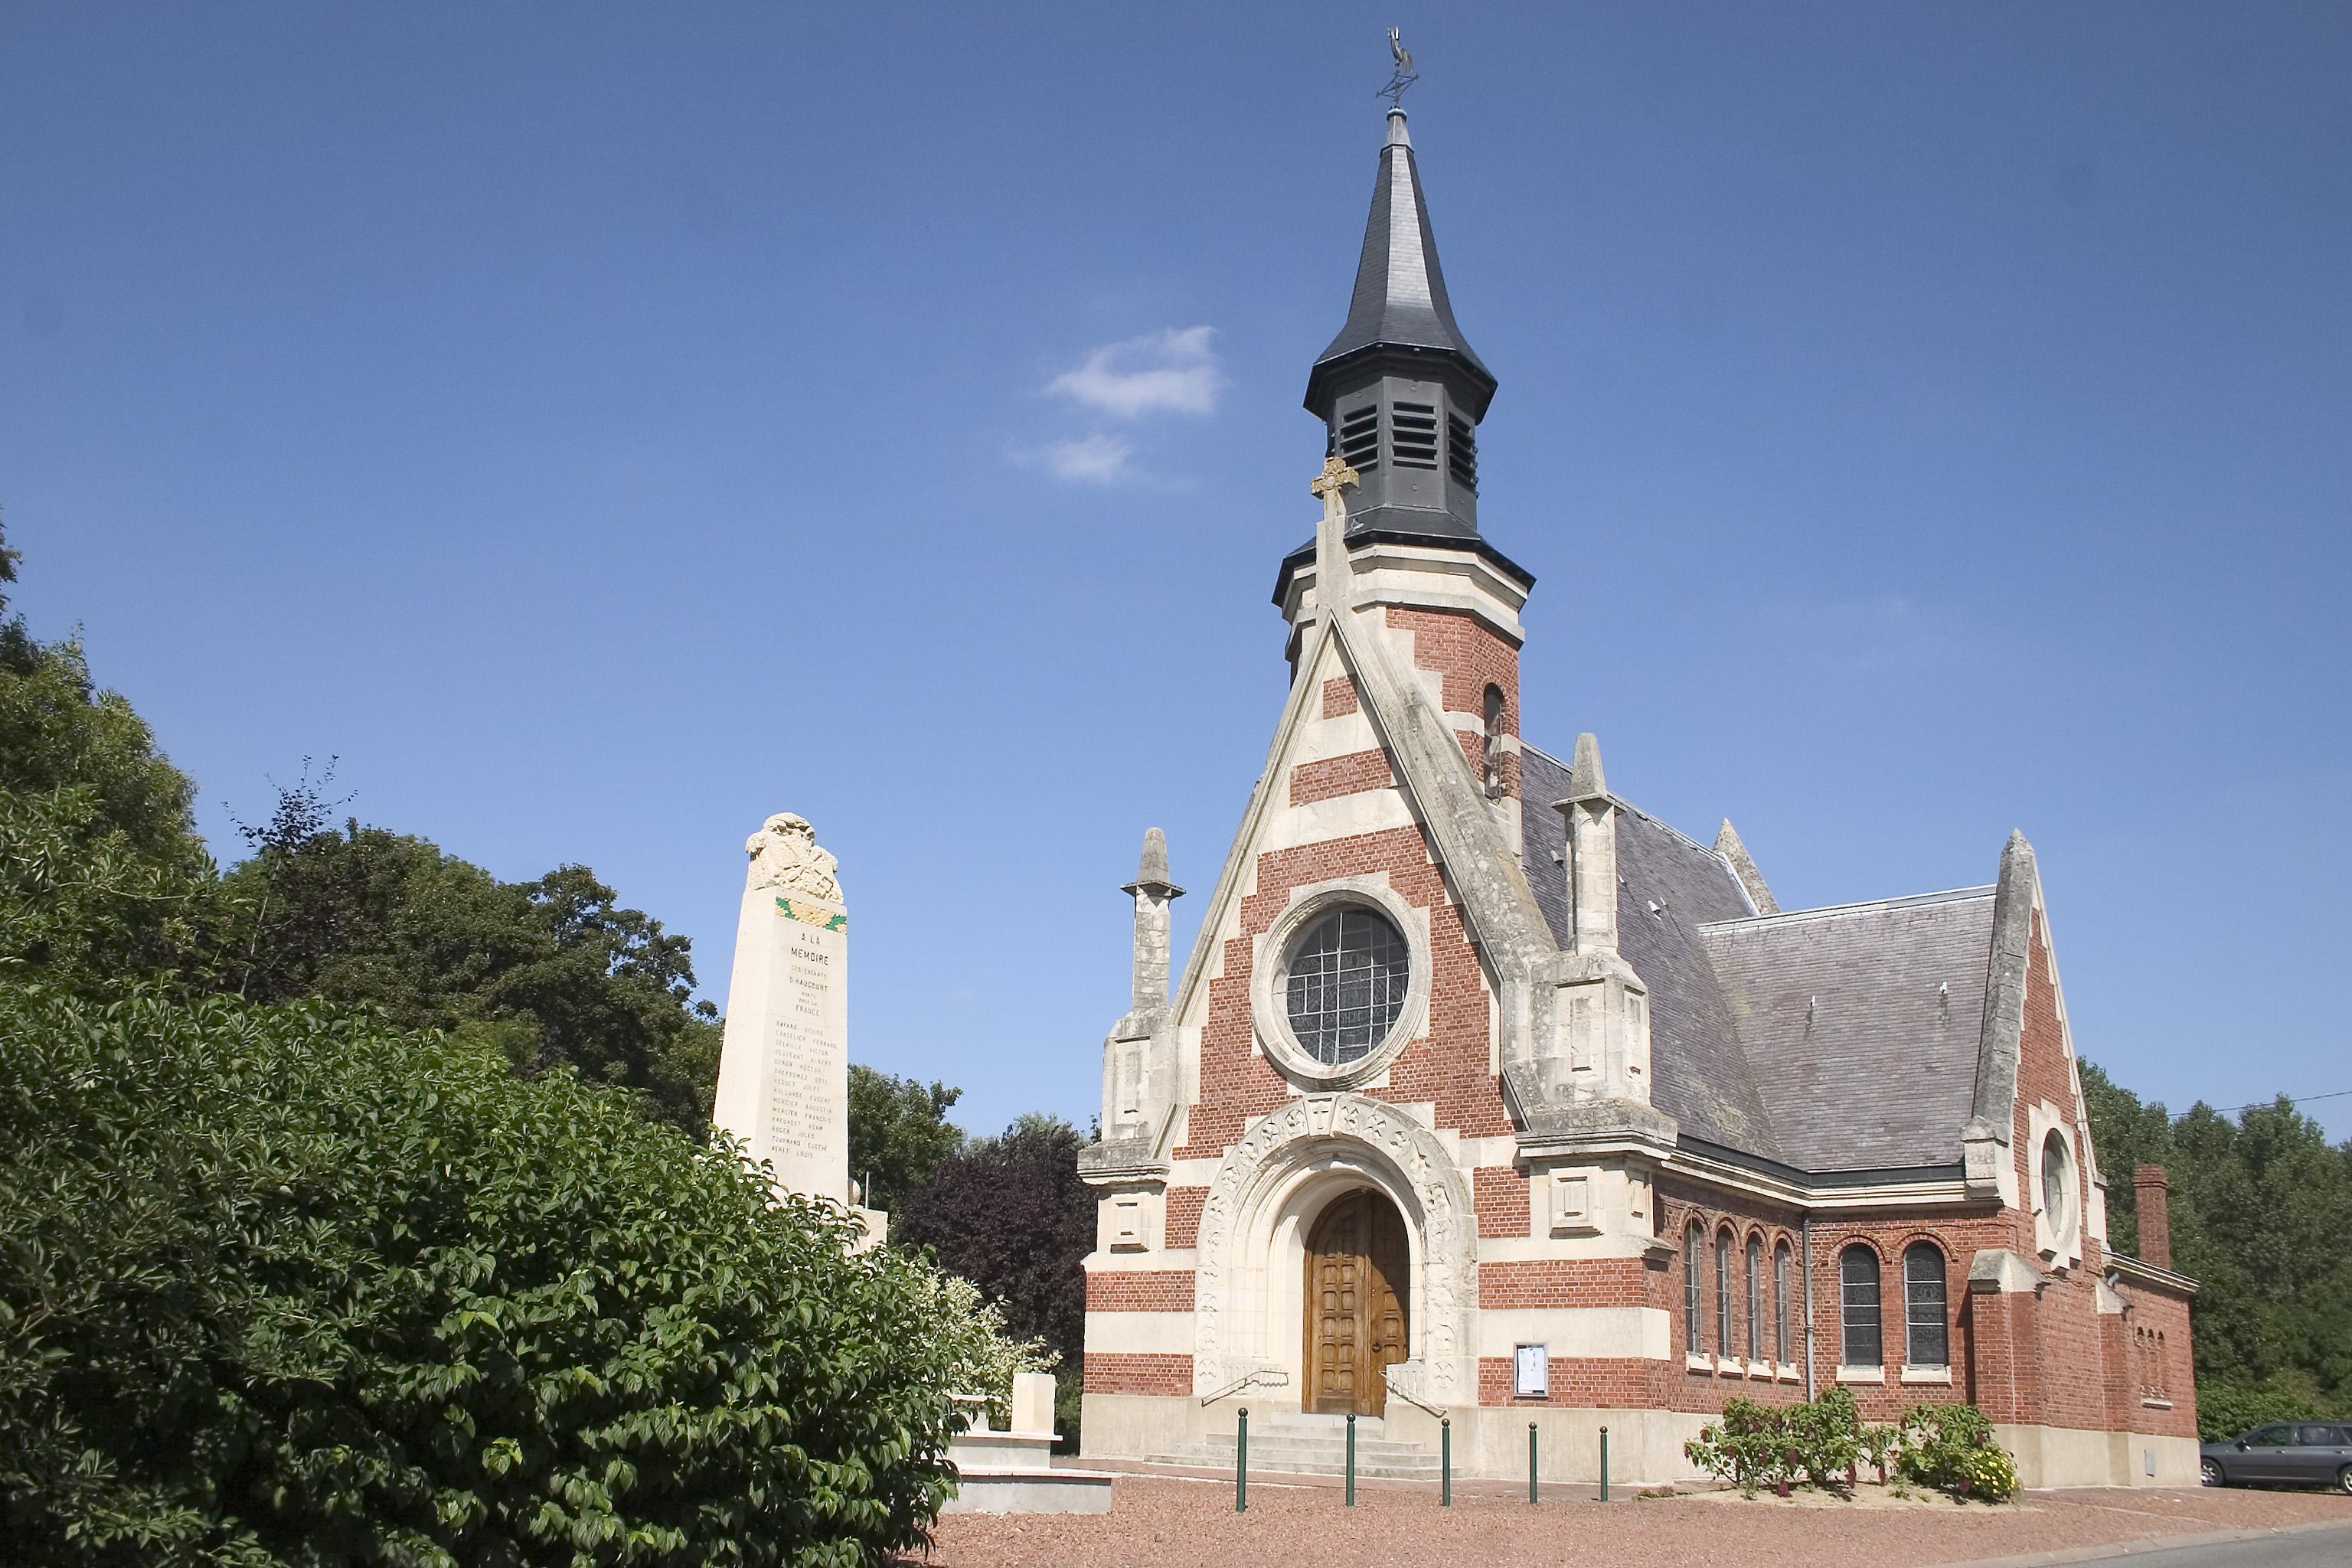 Haucourt (Paso de Calais)